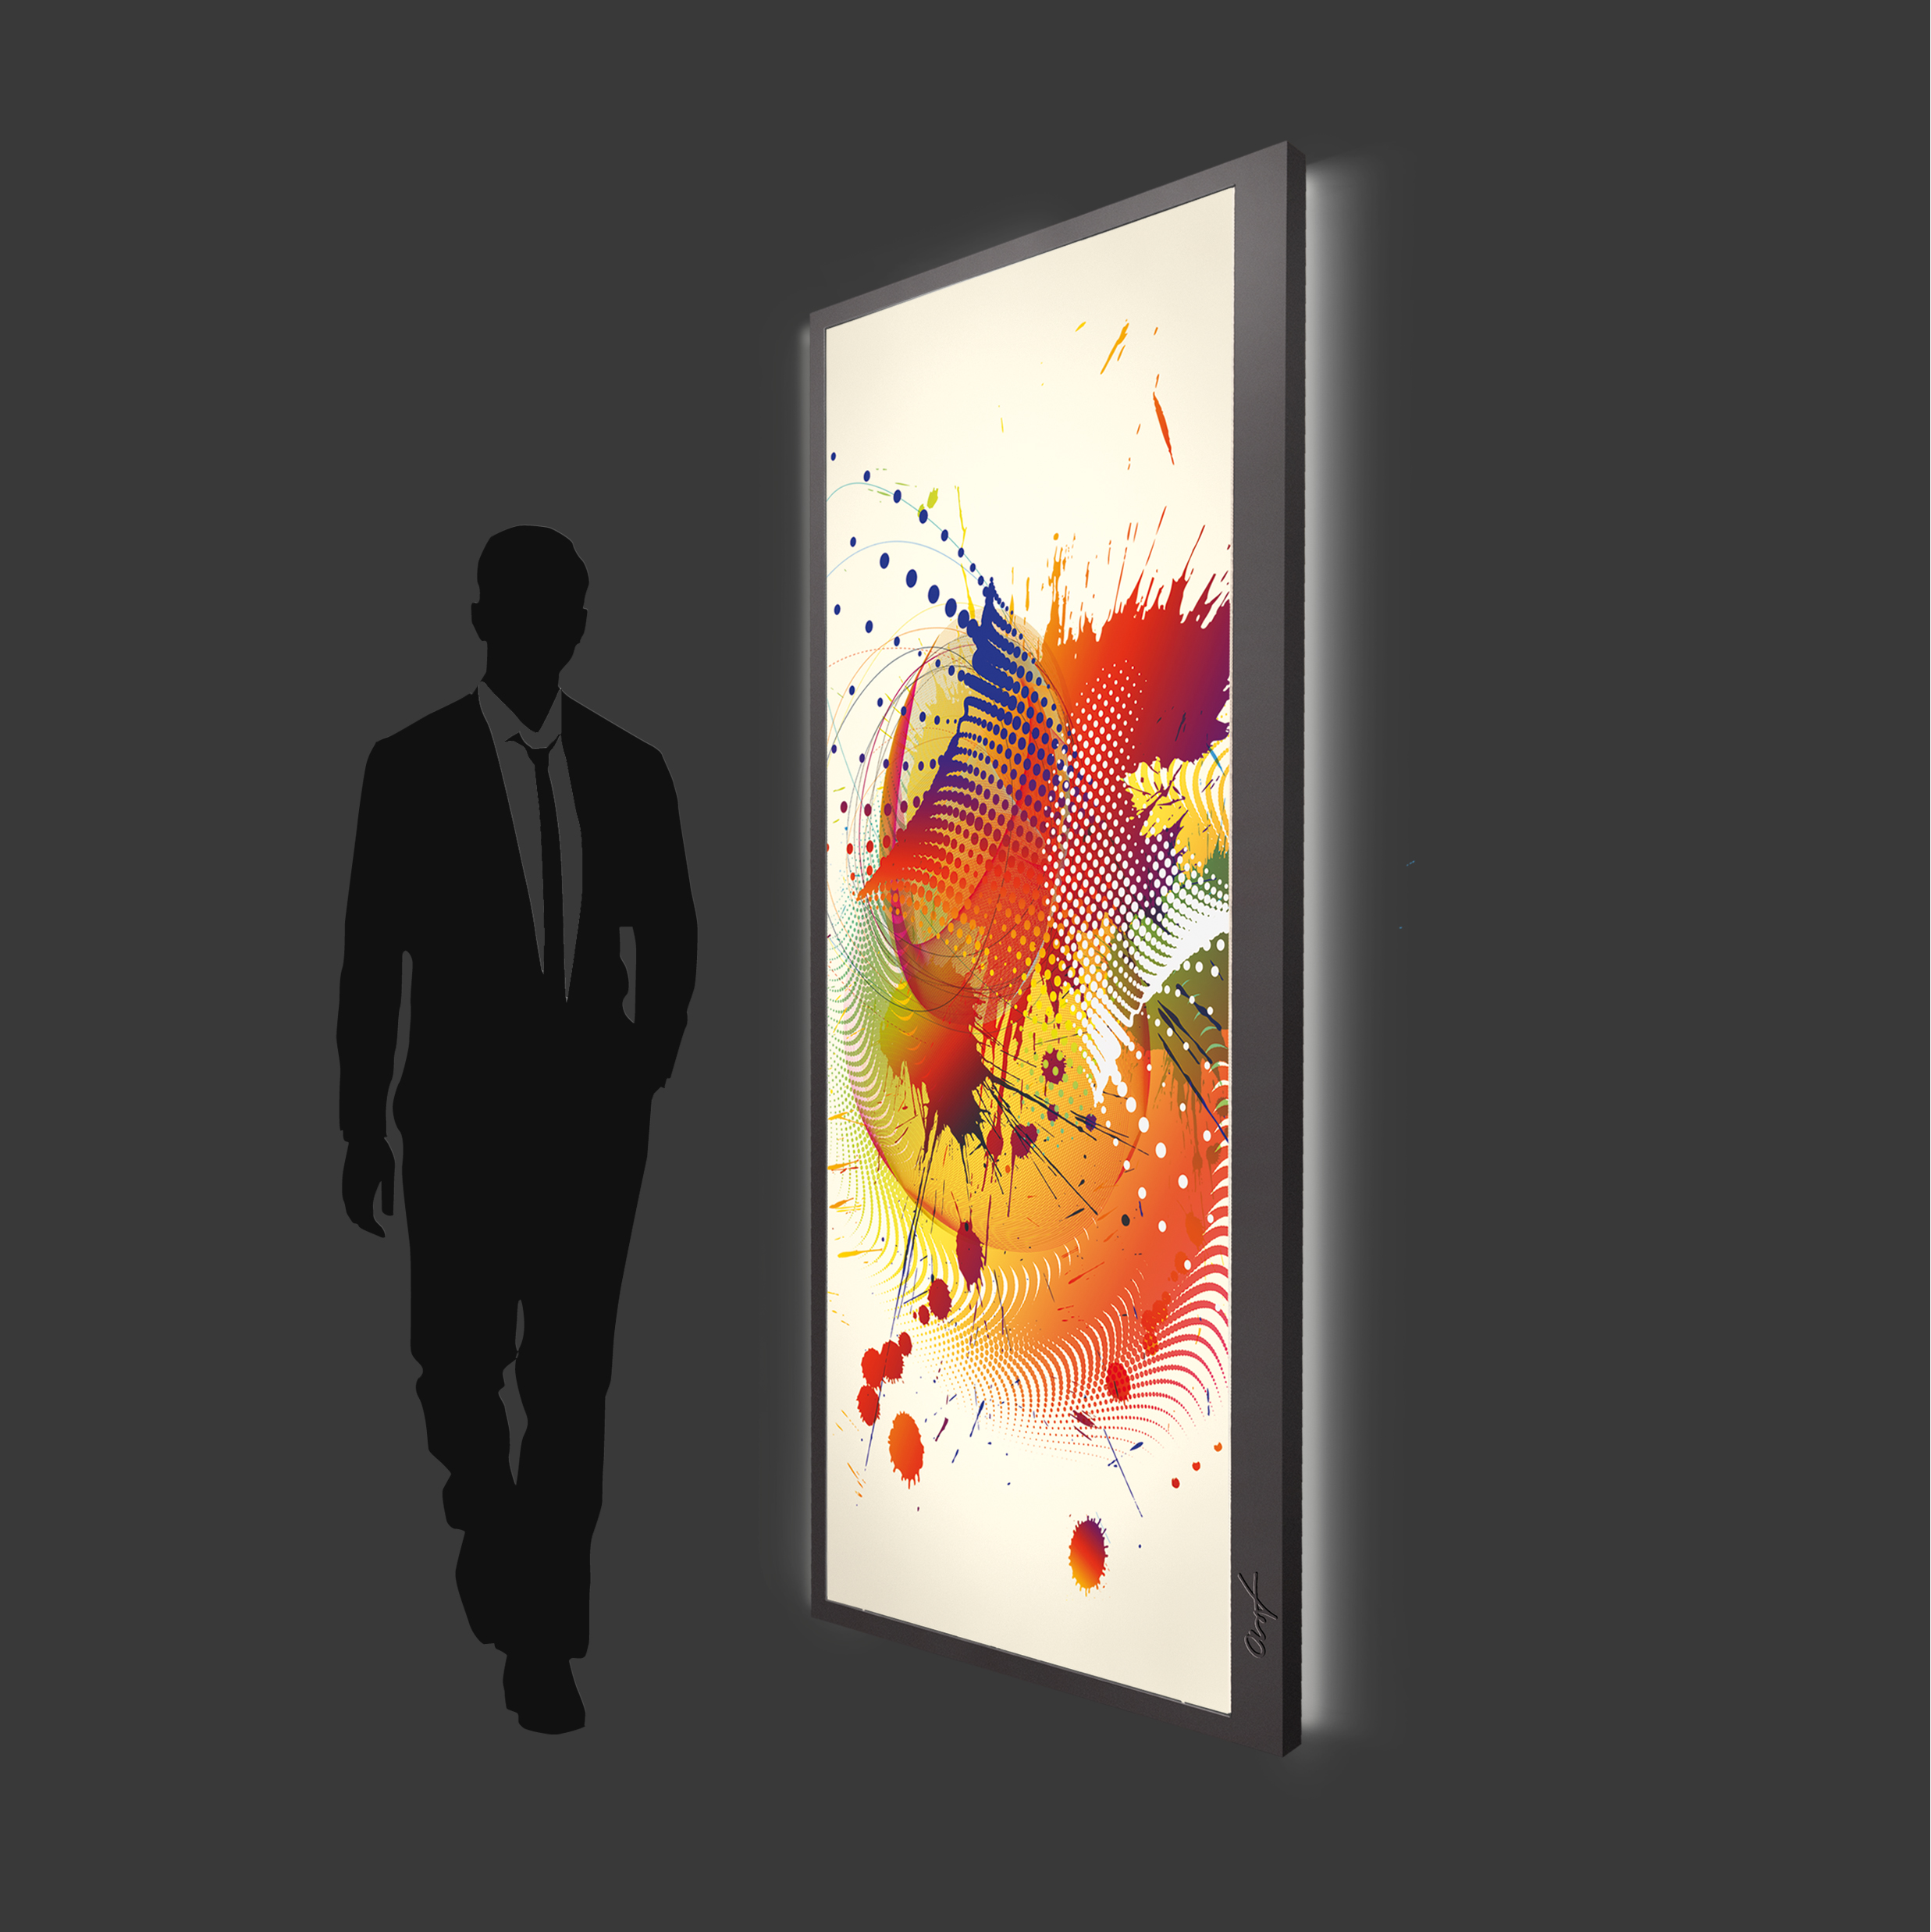 Design Leuchtbild XL vertikal